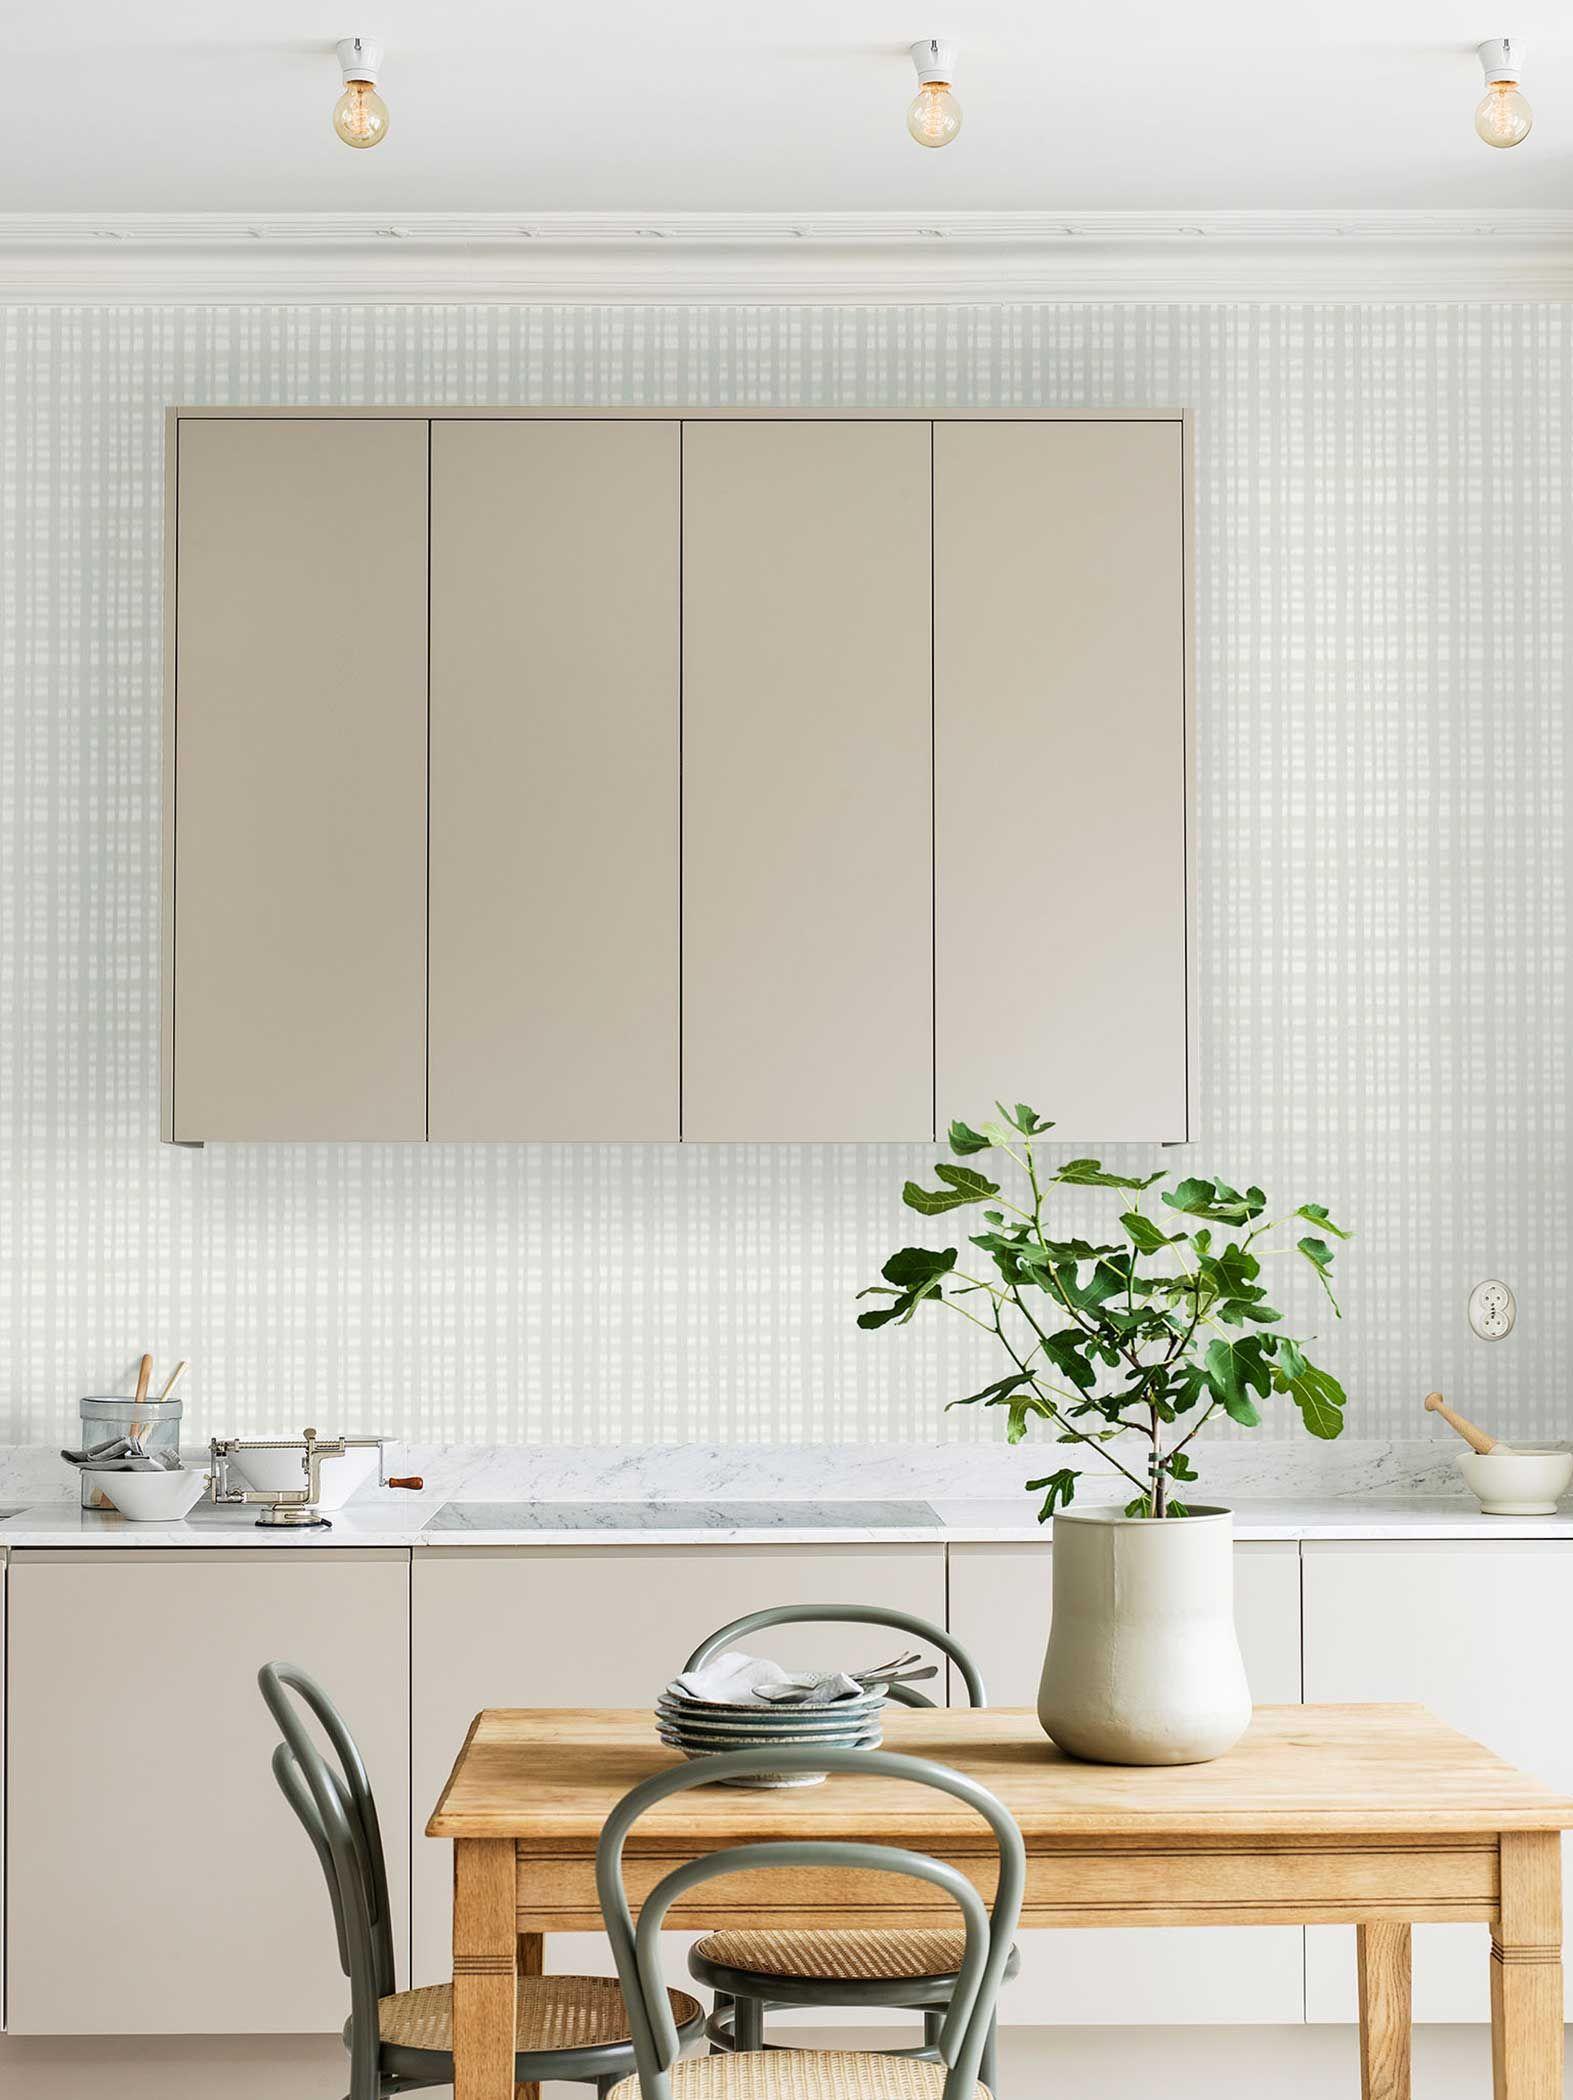 Wallpaper Dining Rooms Ps Feelings 1950s Fabrics Kitchens Desktop Room